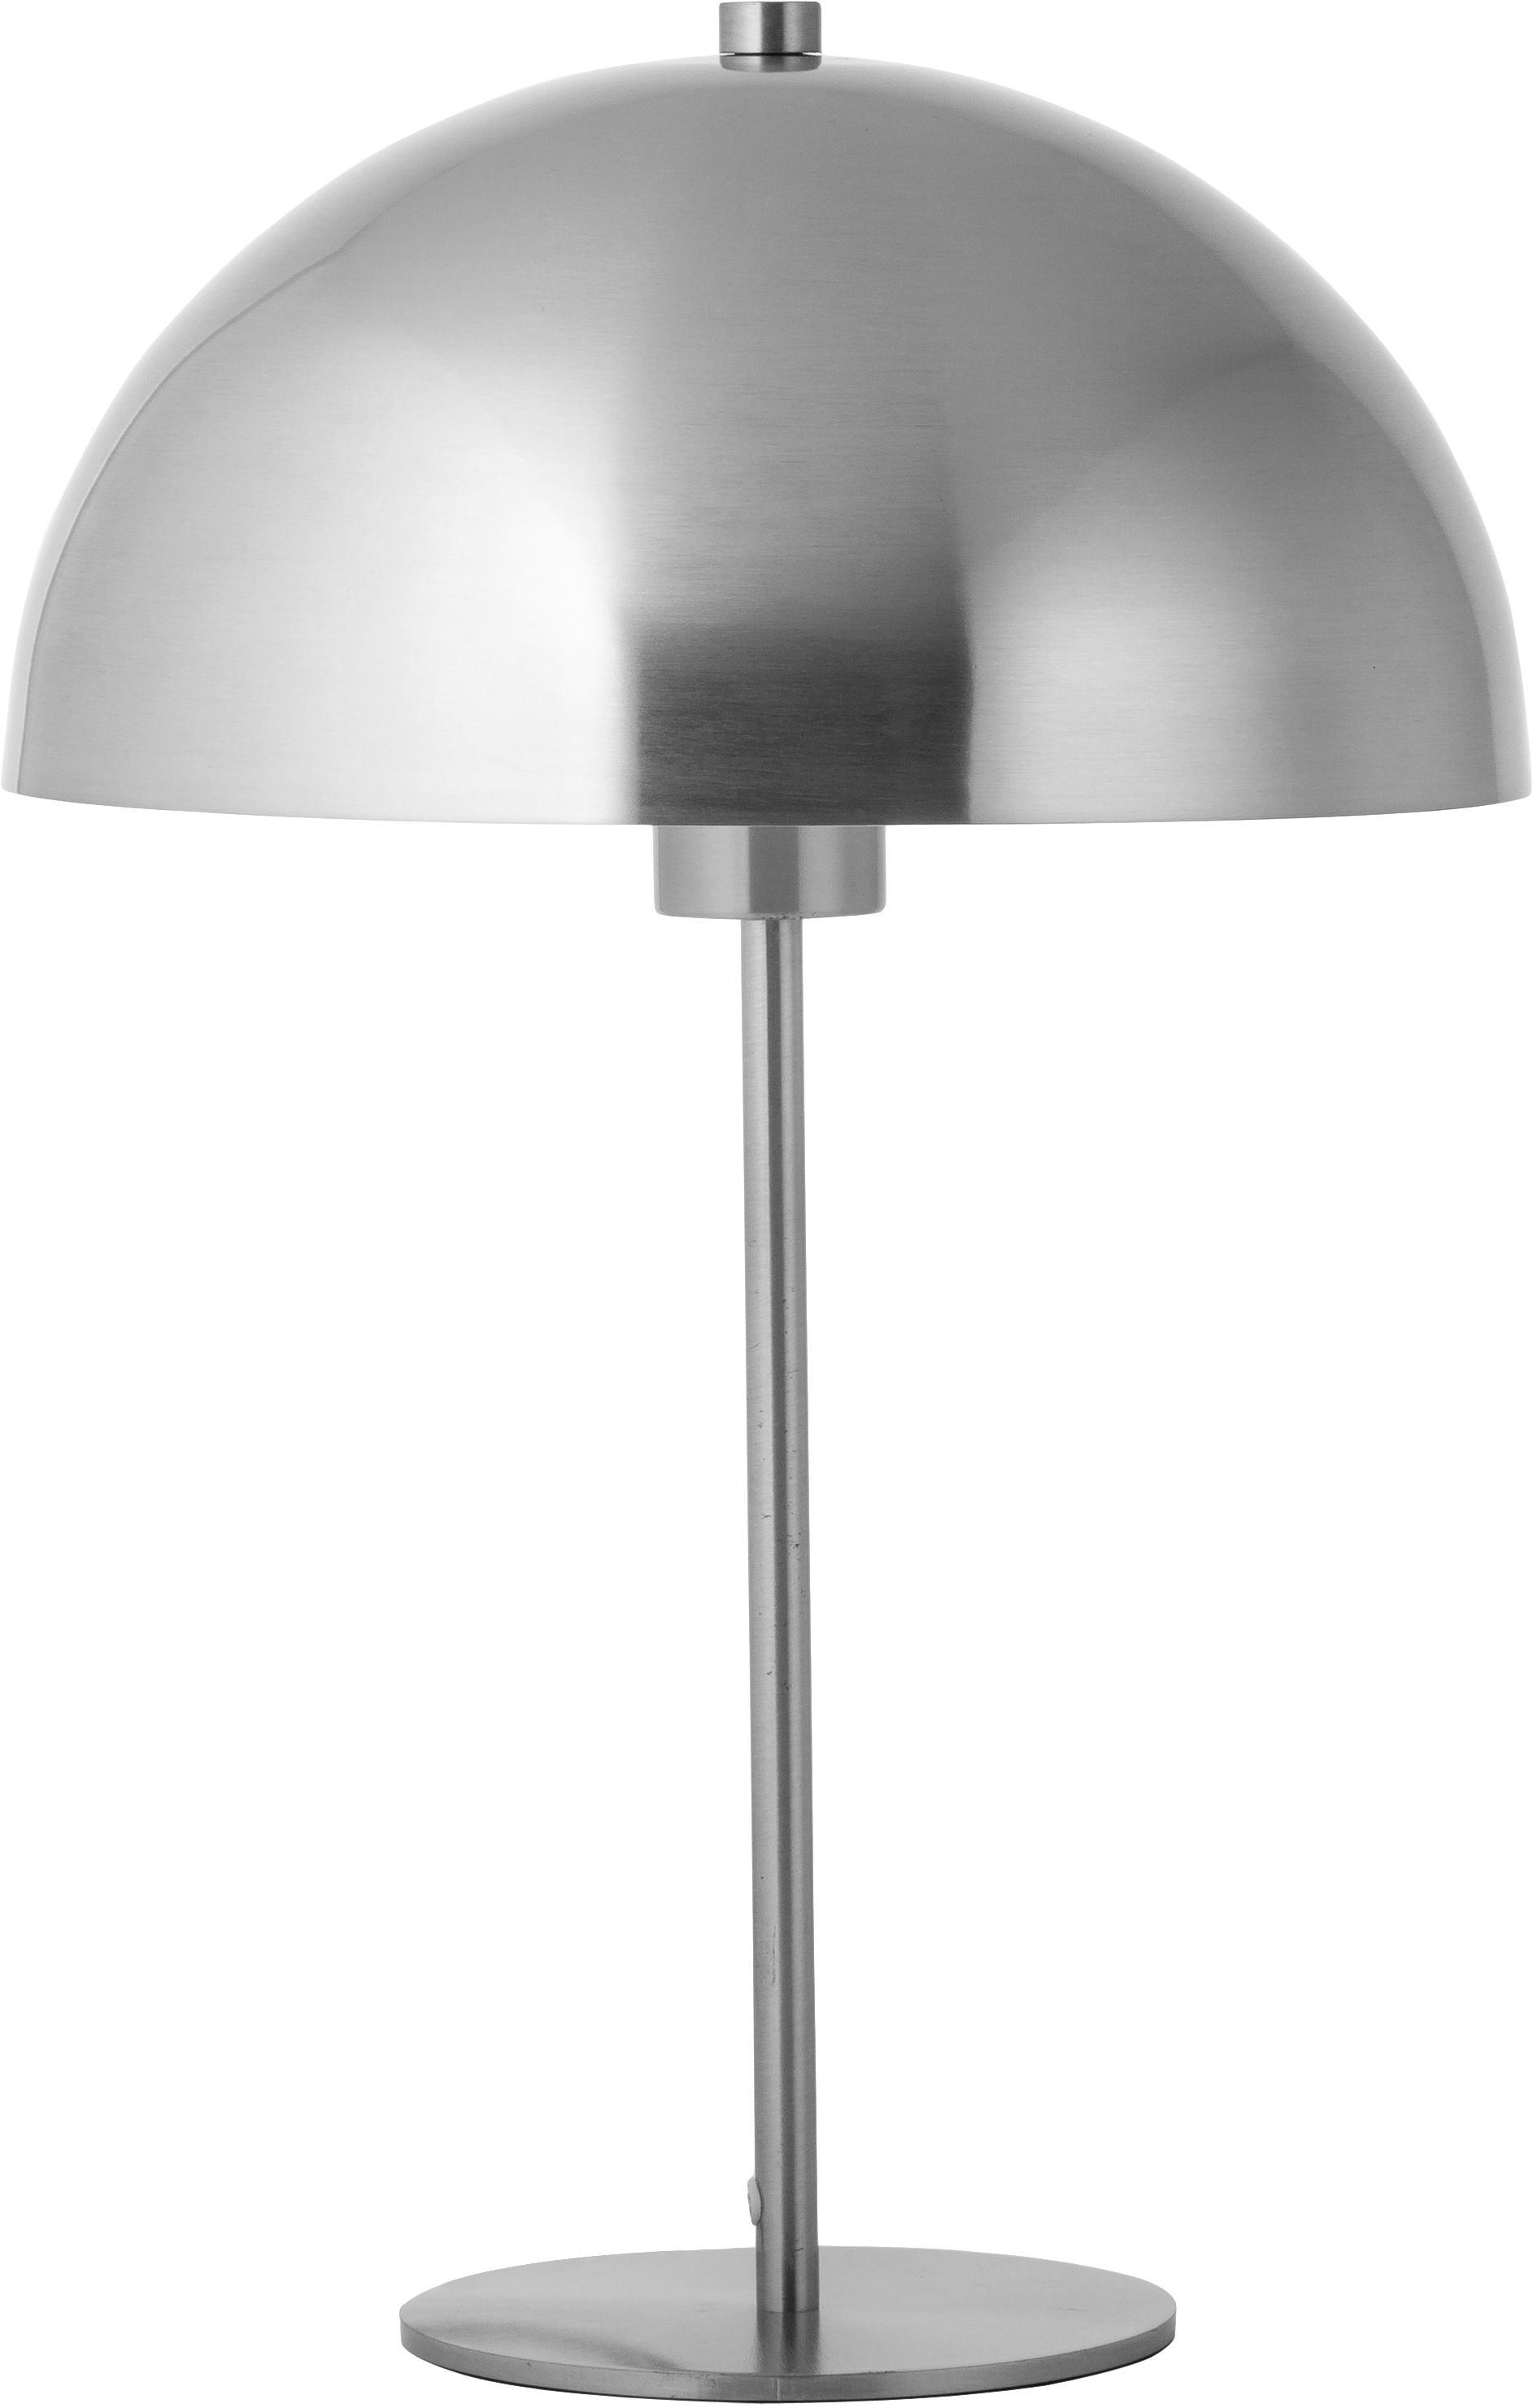 Tischlampe Matilda aus Metall, Lampenschirm: Metall, vernickelt, Nickel, Ø 29 x H 45 cm